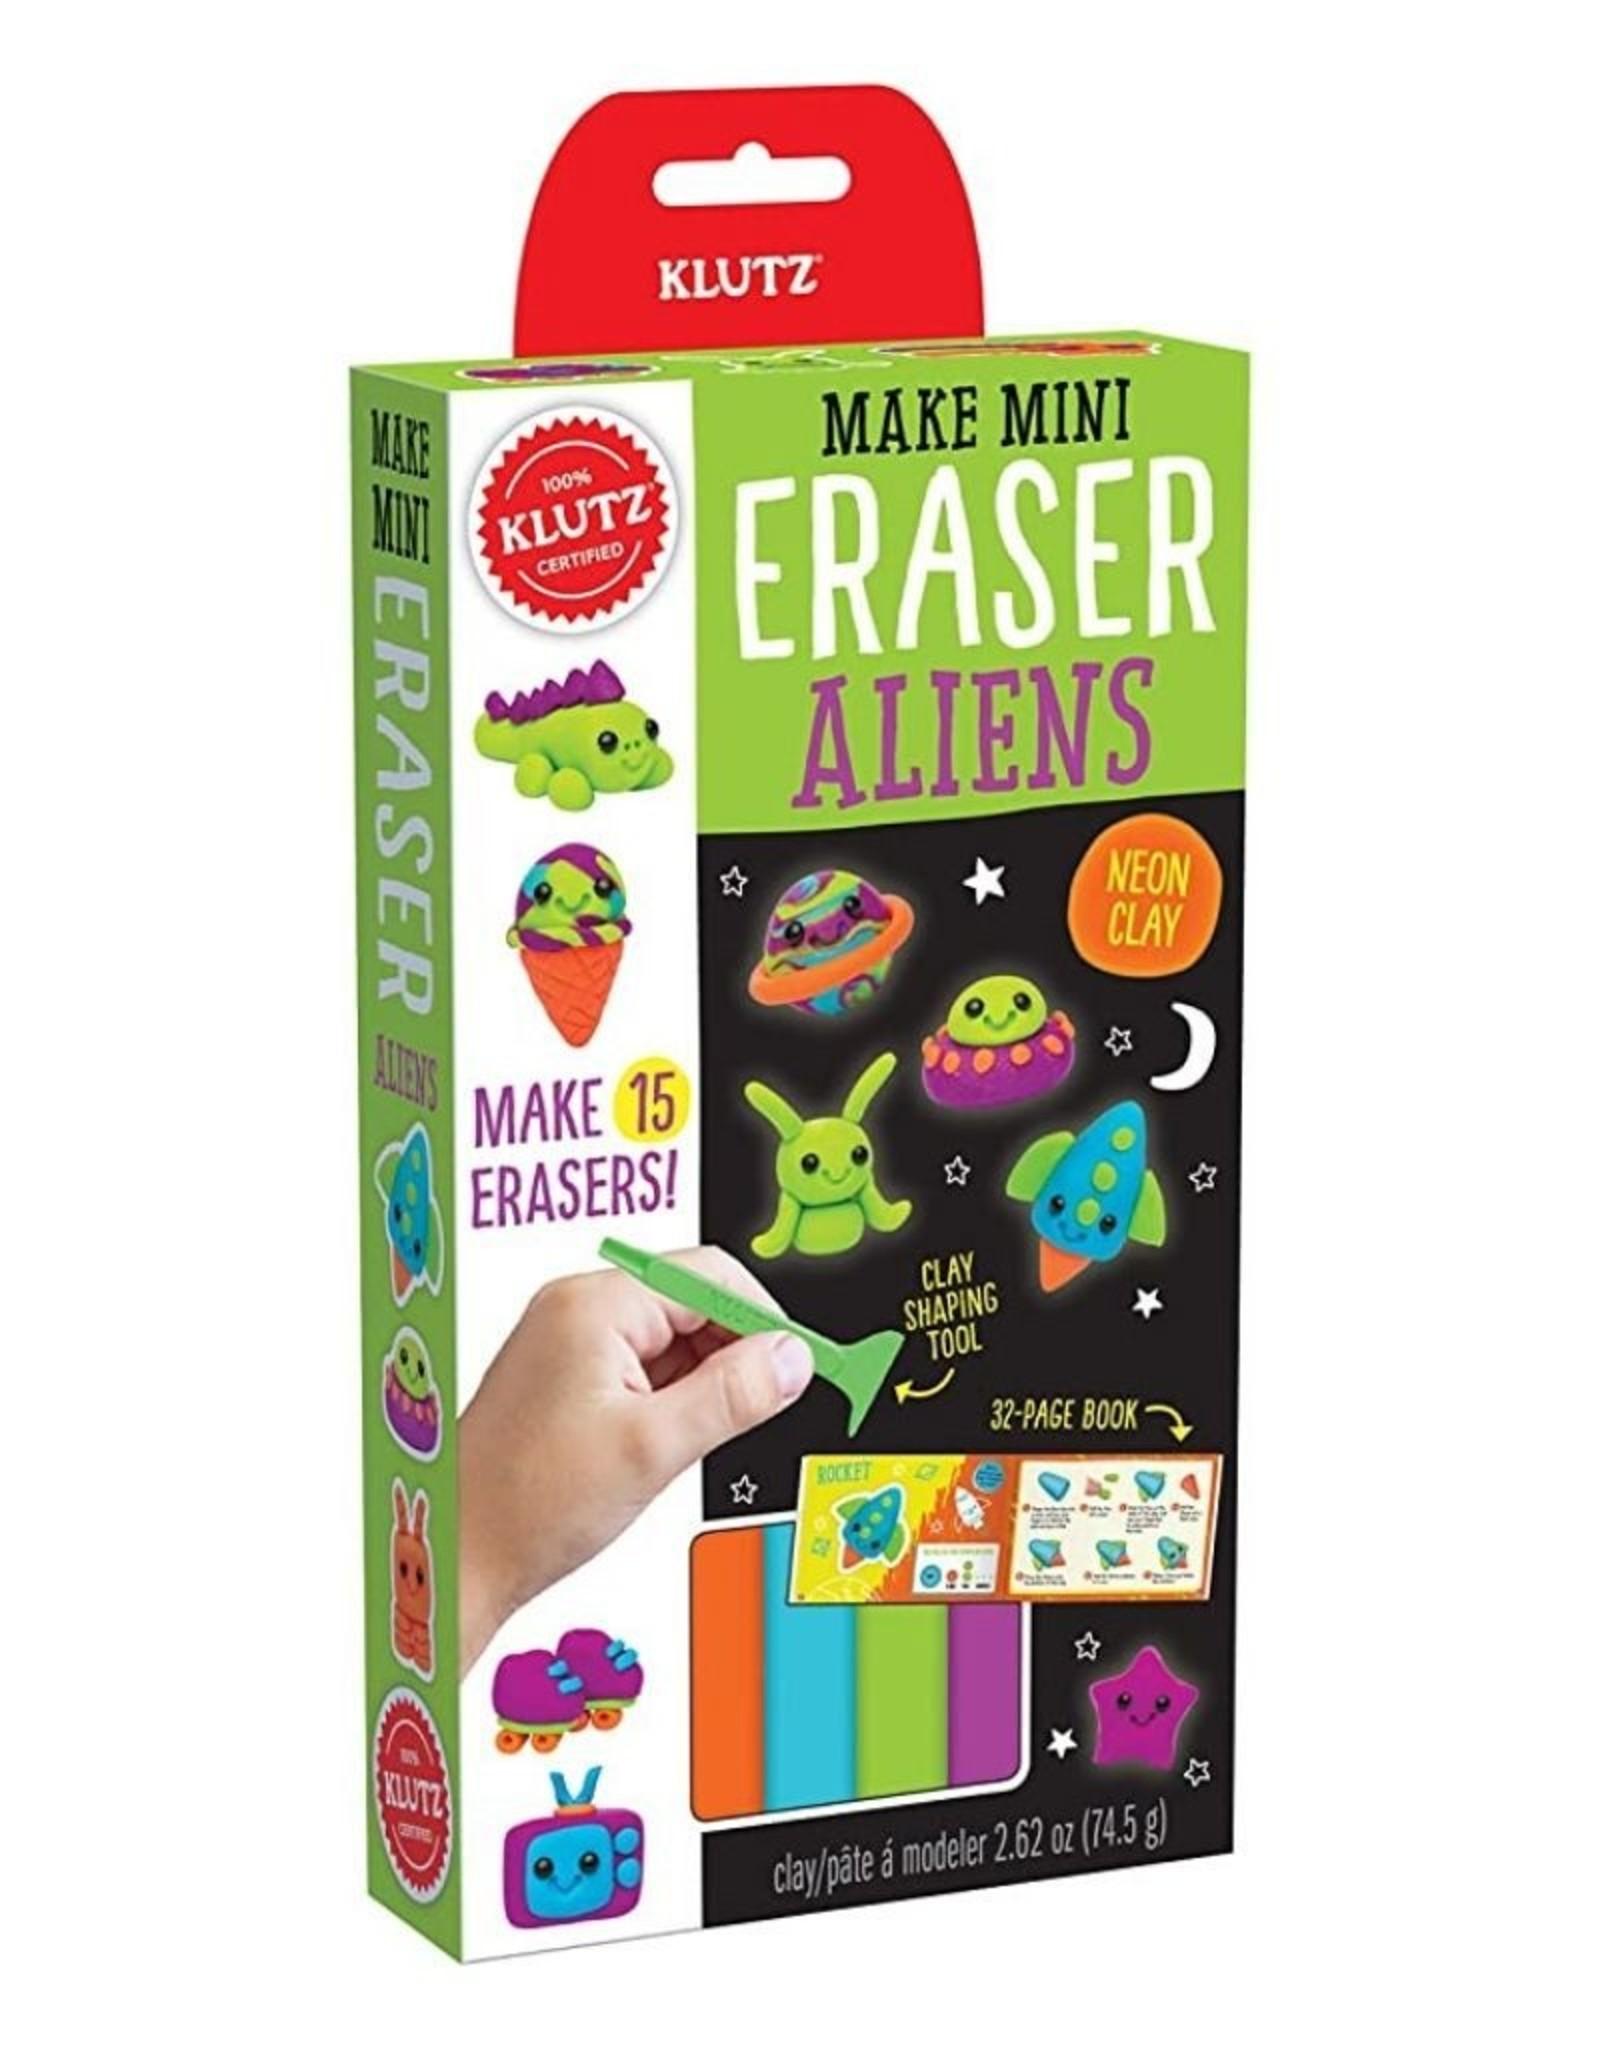 Klutz Make Mini Eraser Alien